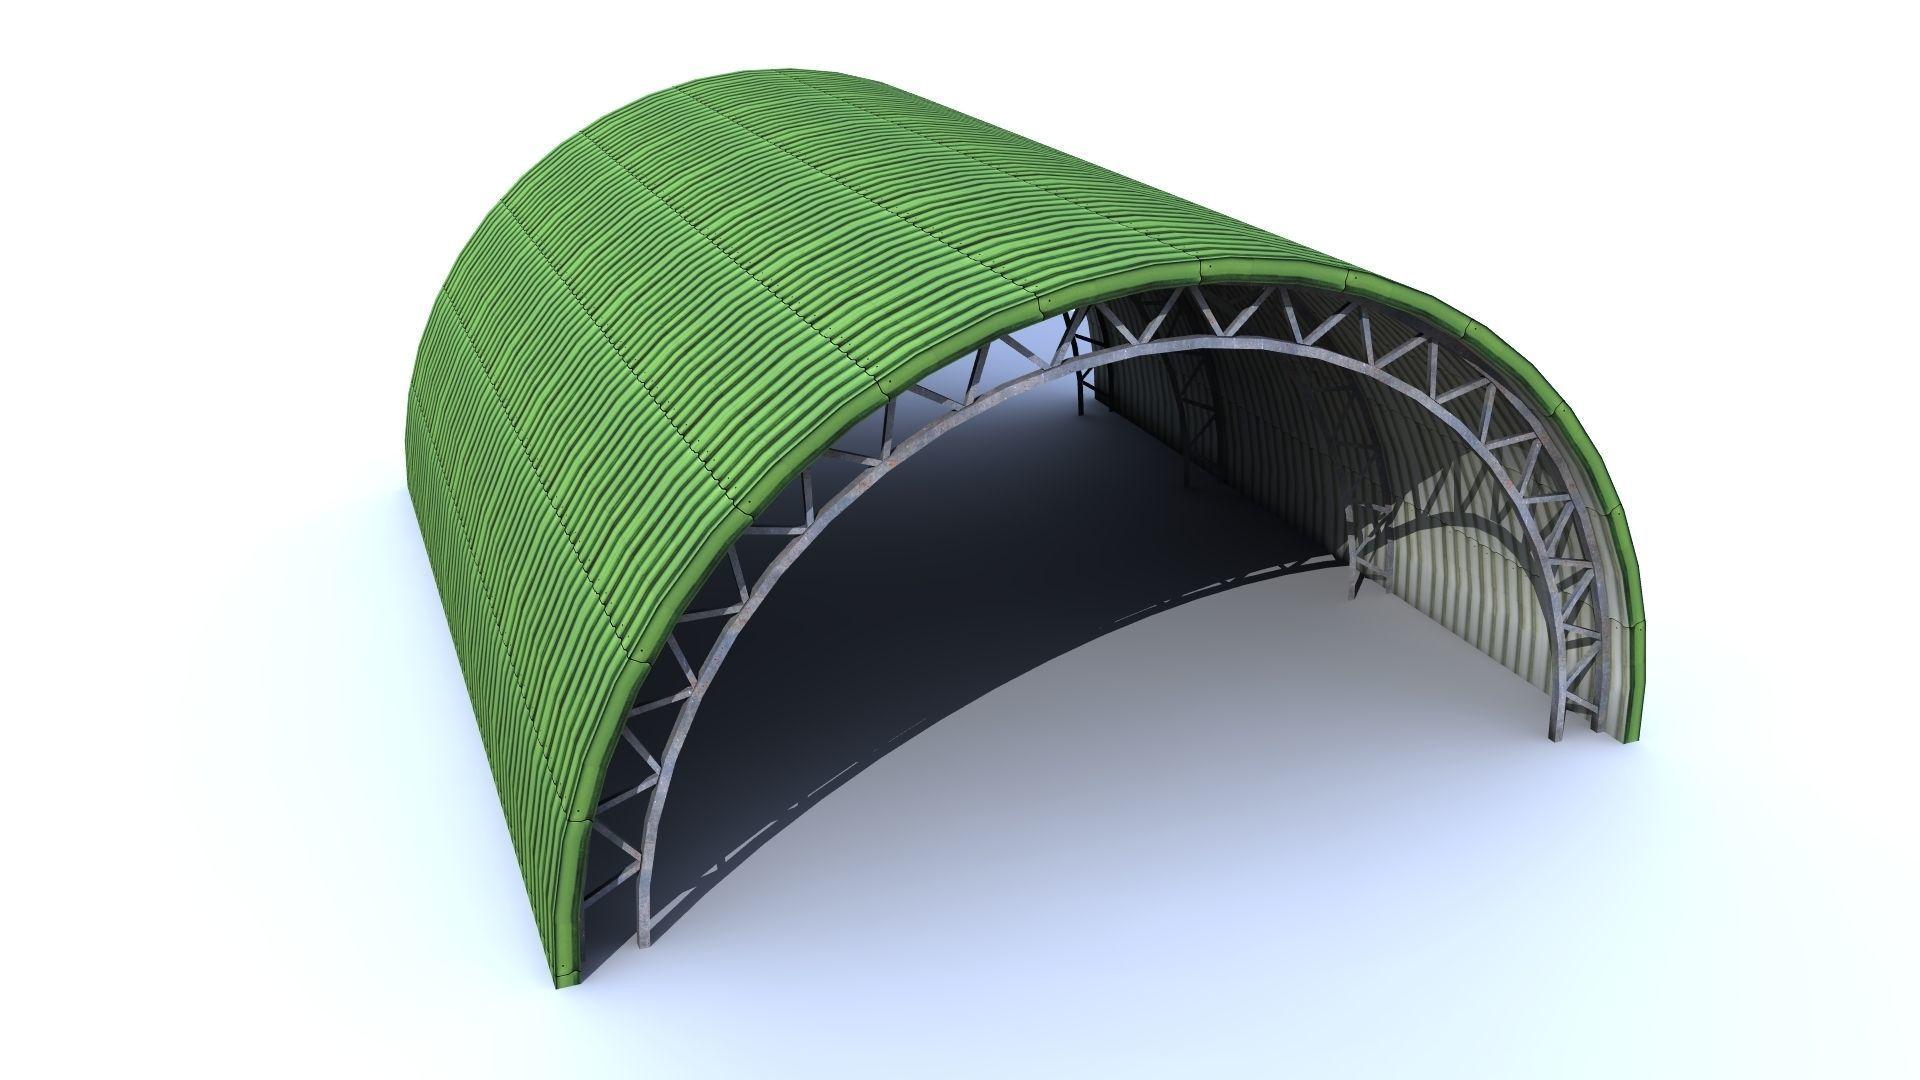 Aircraft low poly - Shelter Hangar FREE